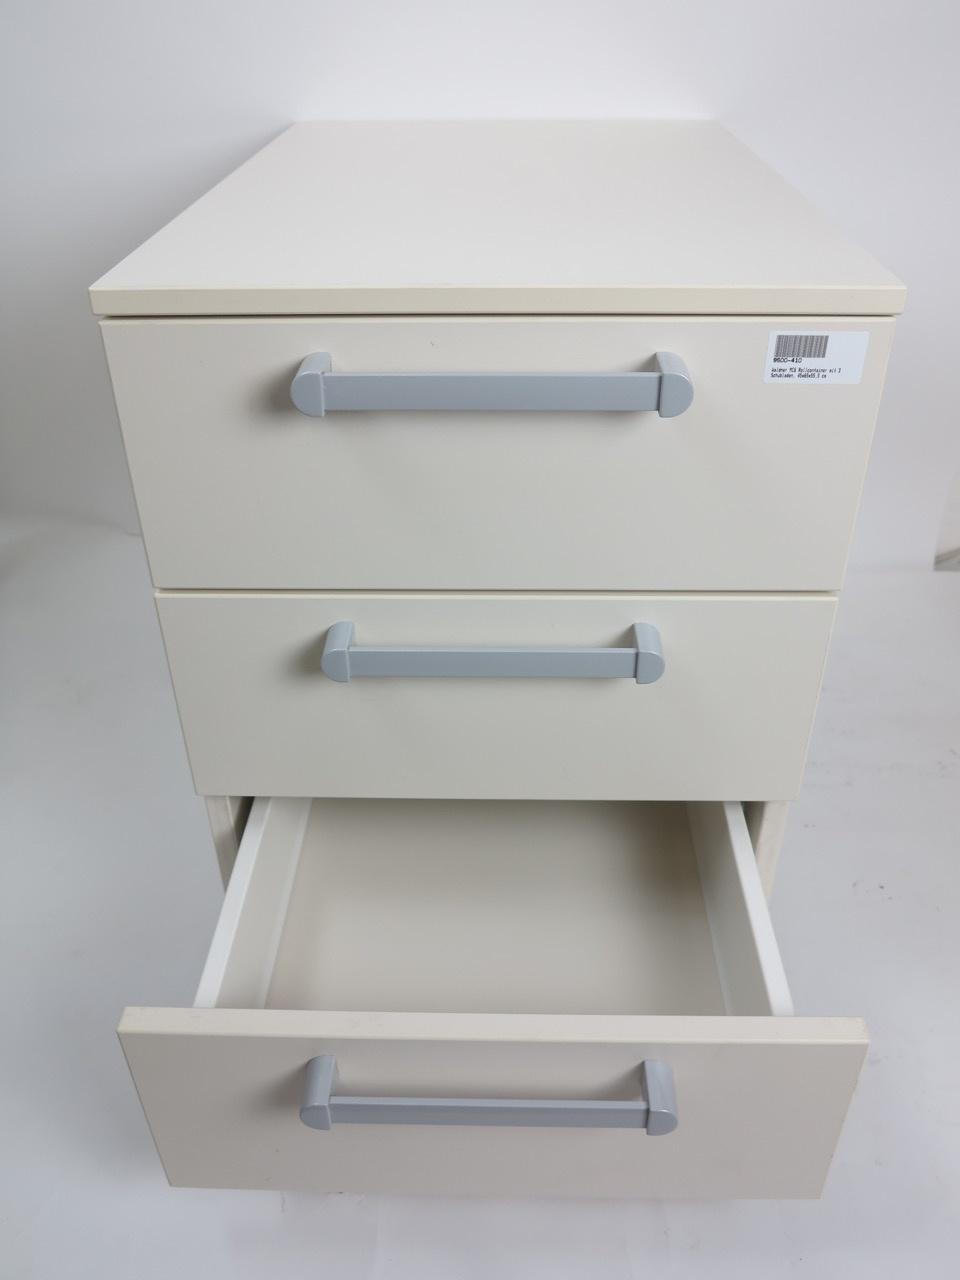 Waldner Waldner MC6 mobile cabinet, 3 drawers, 45 cm width, 55cm height